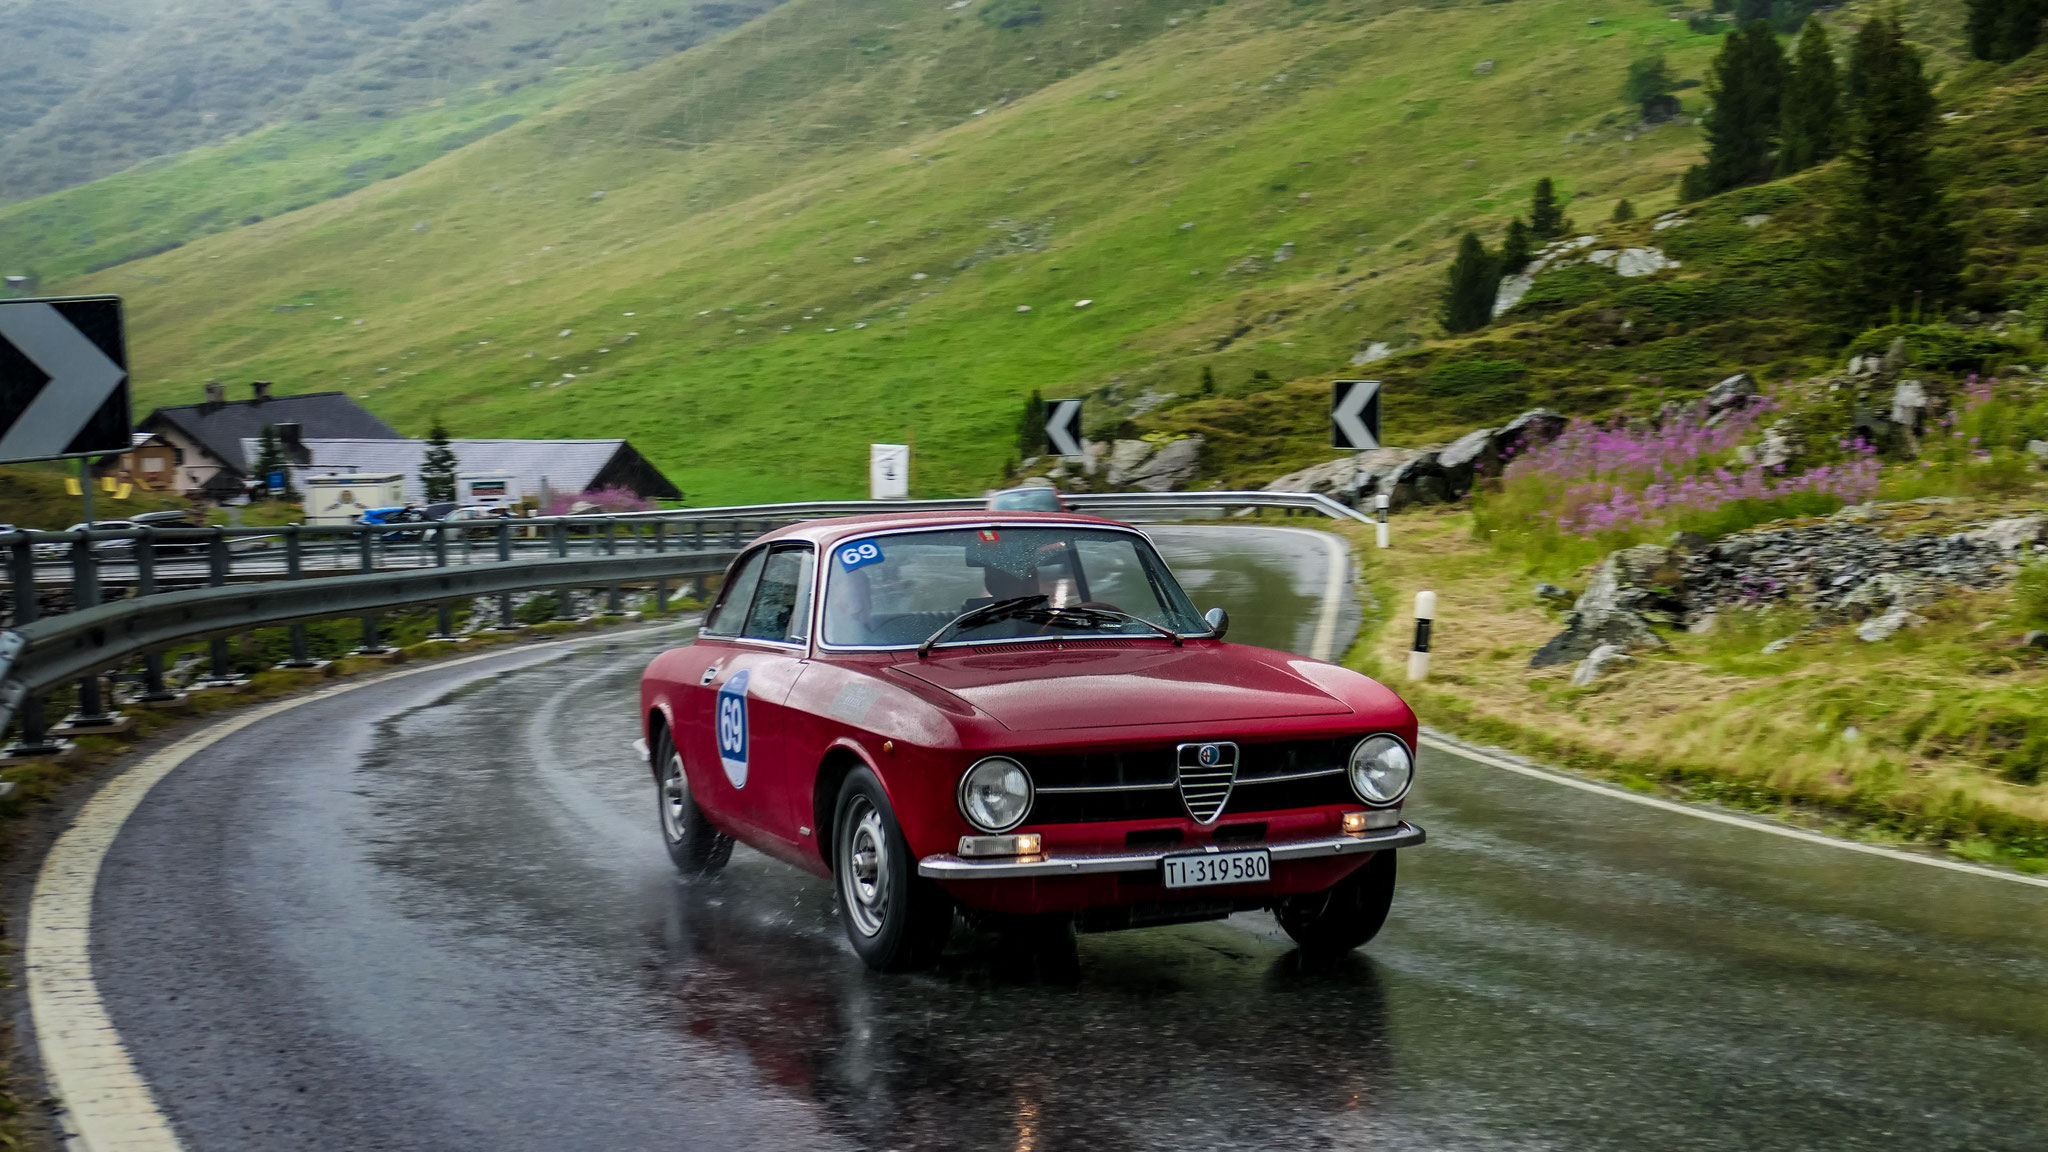 Alfa Romeo Giulia Sprint GT - TI-319580 (CH)